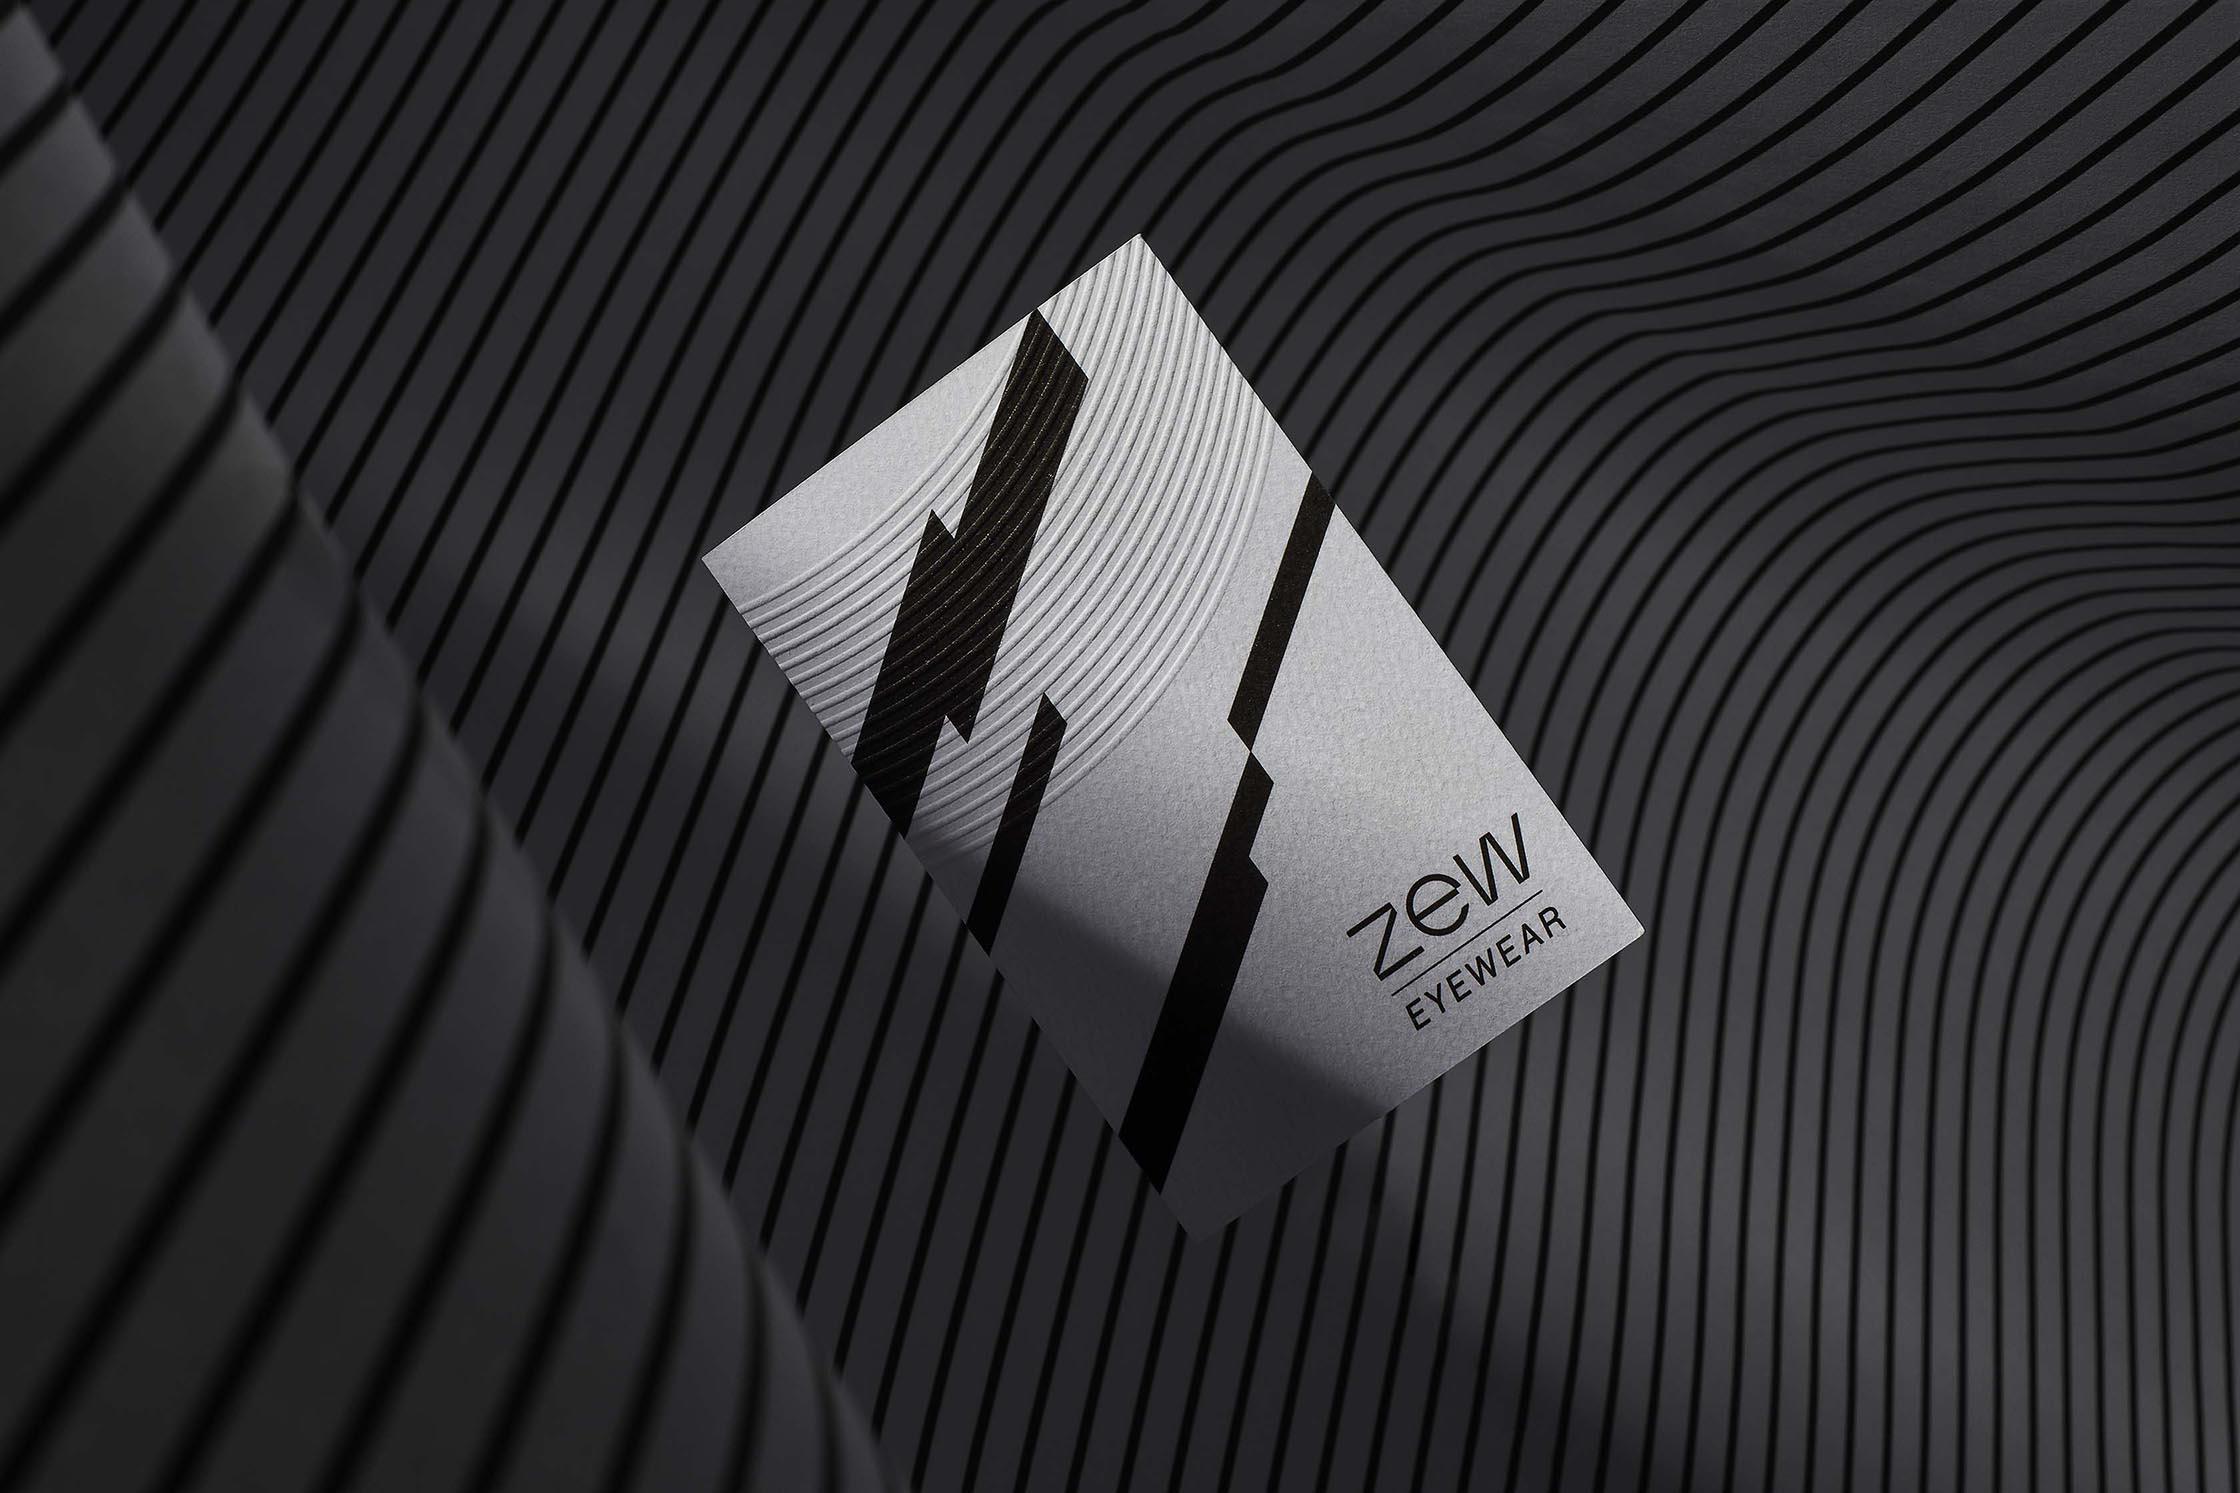 ZEW_Veronika_Rut_Novakova_Design_10m